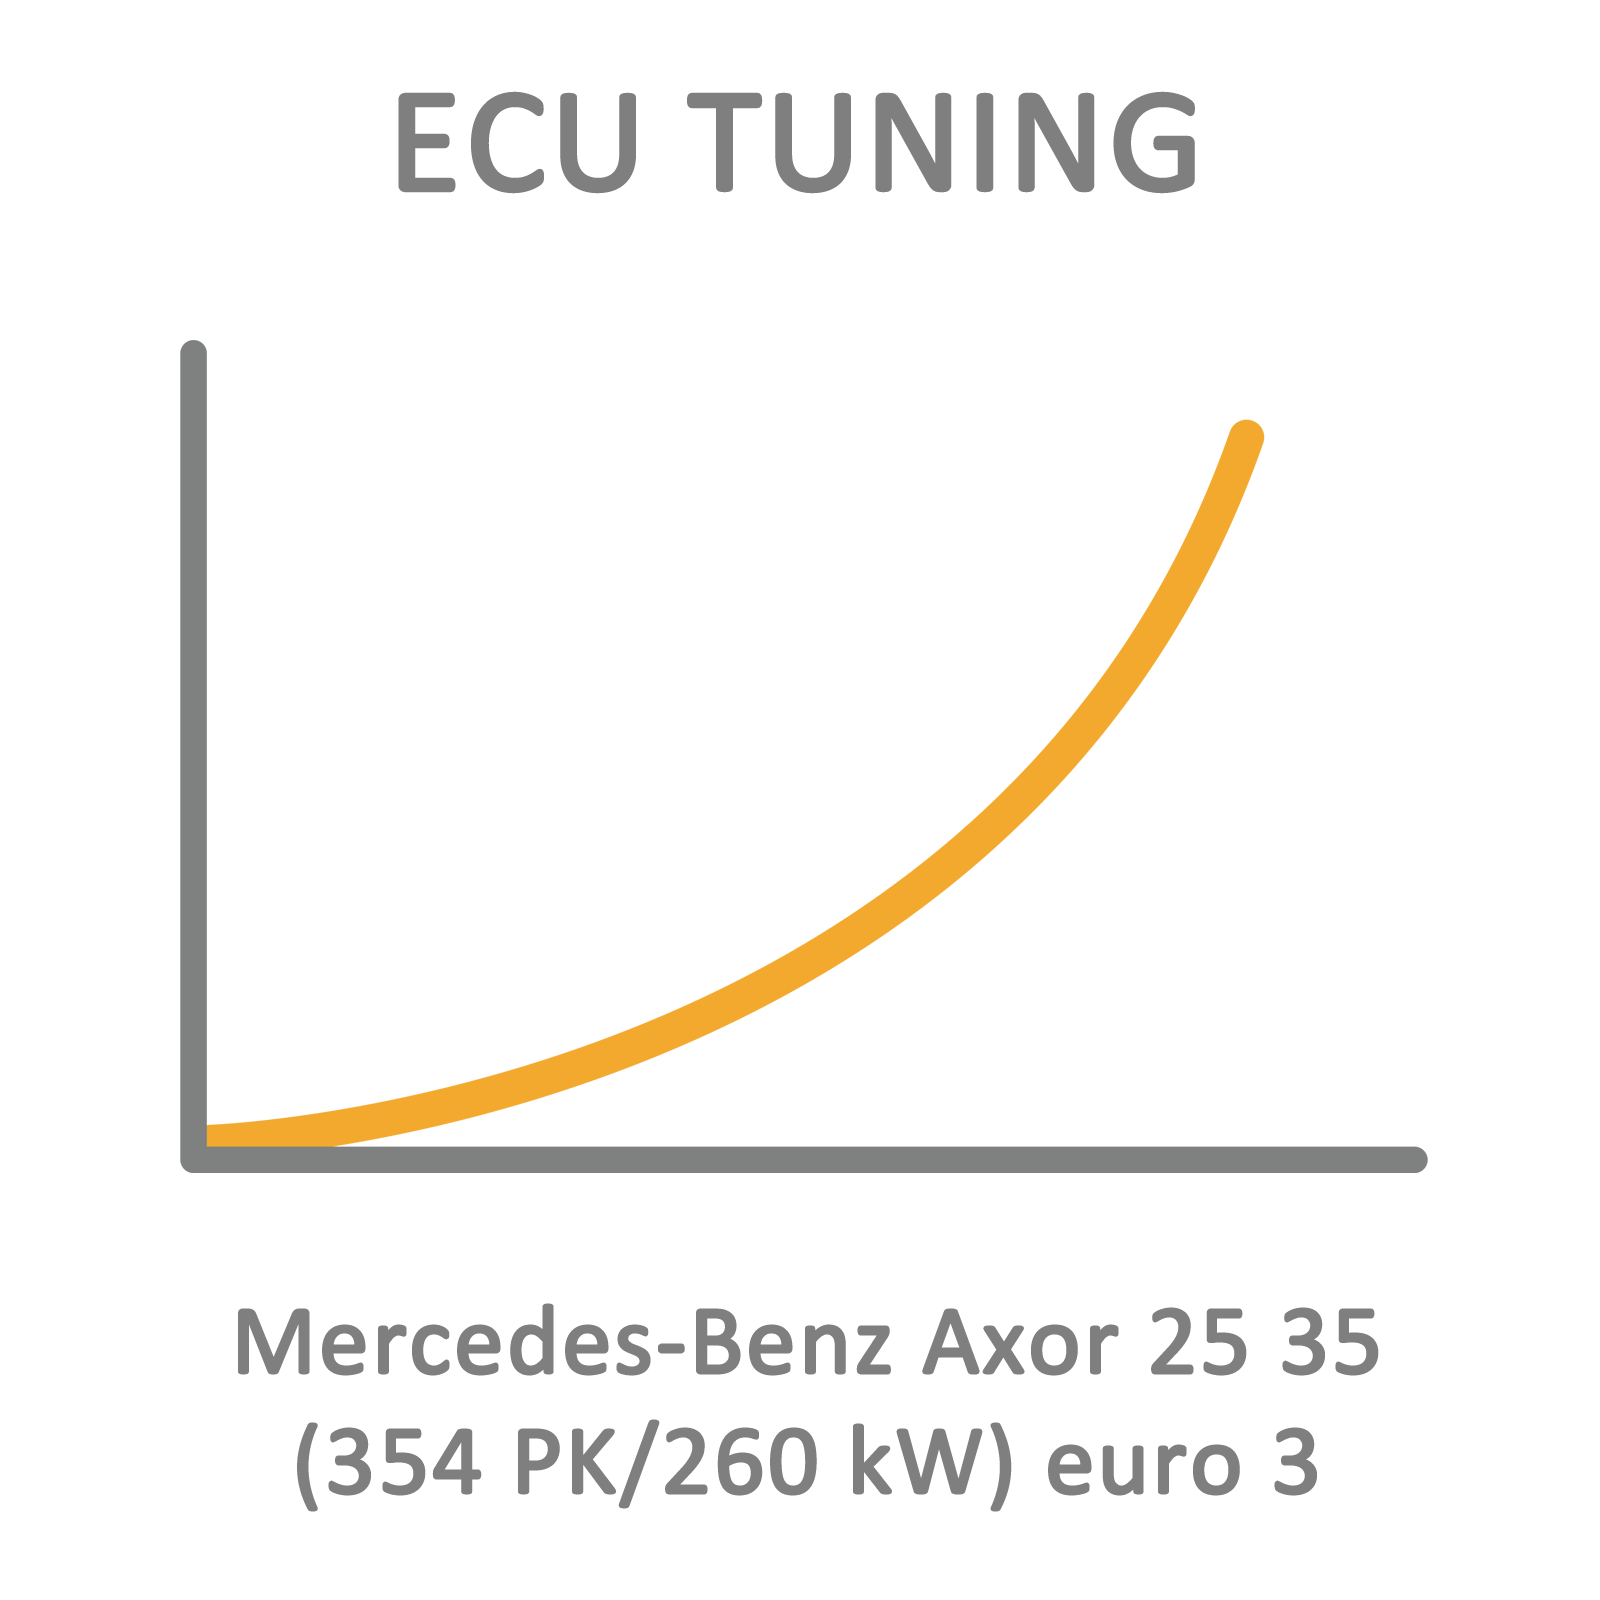 Mercedes-Benz Axor 25 35 (354 PK/260 kW) euro 3 ECU Tuning